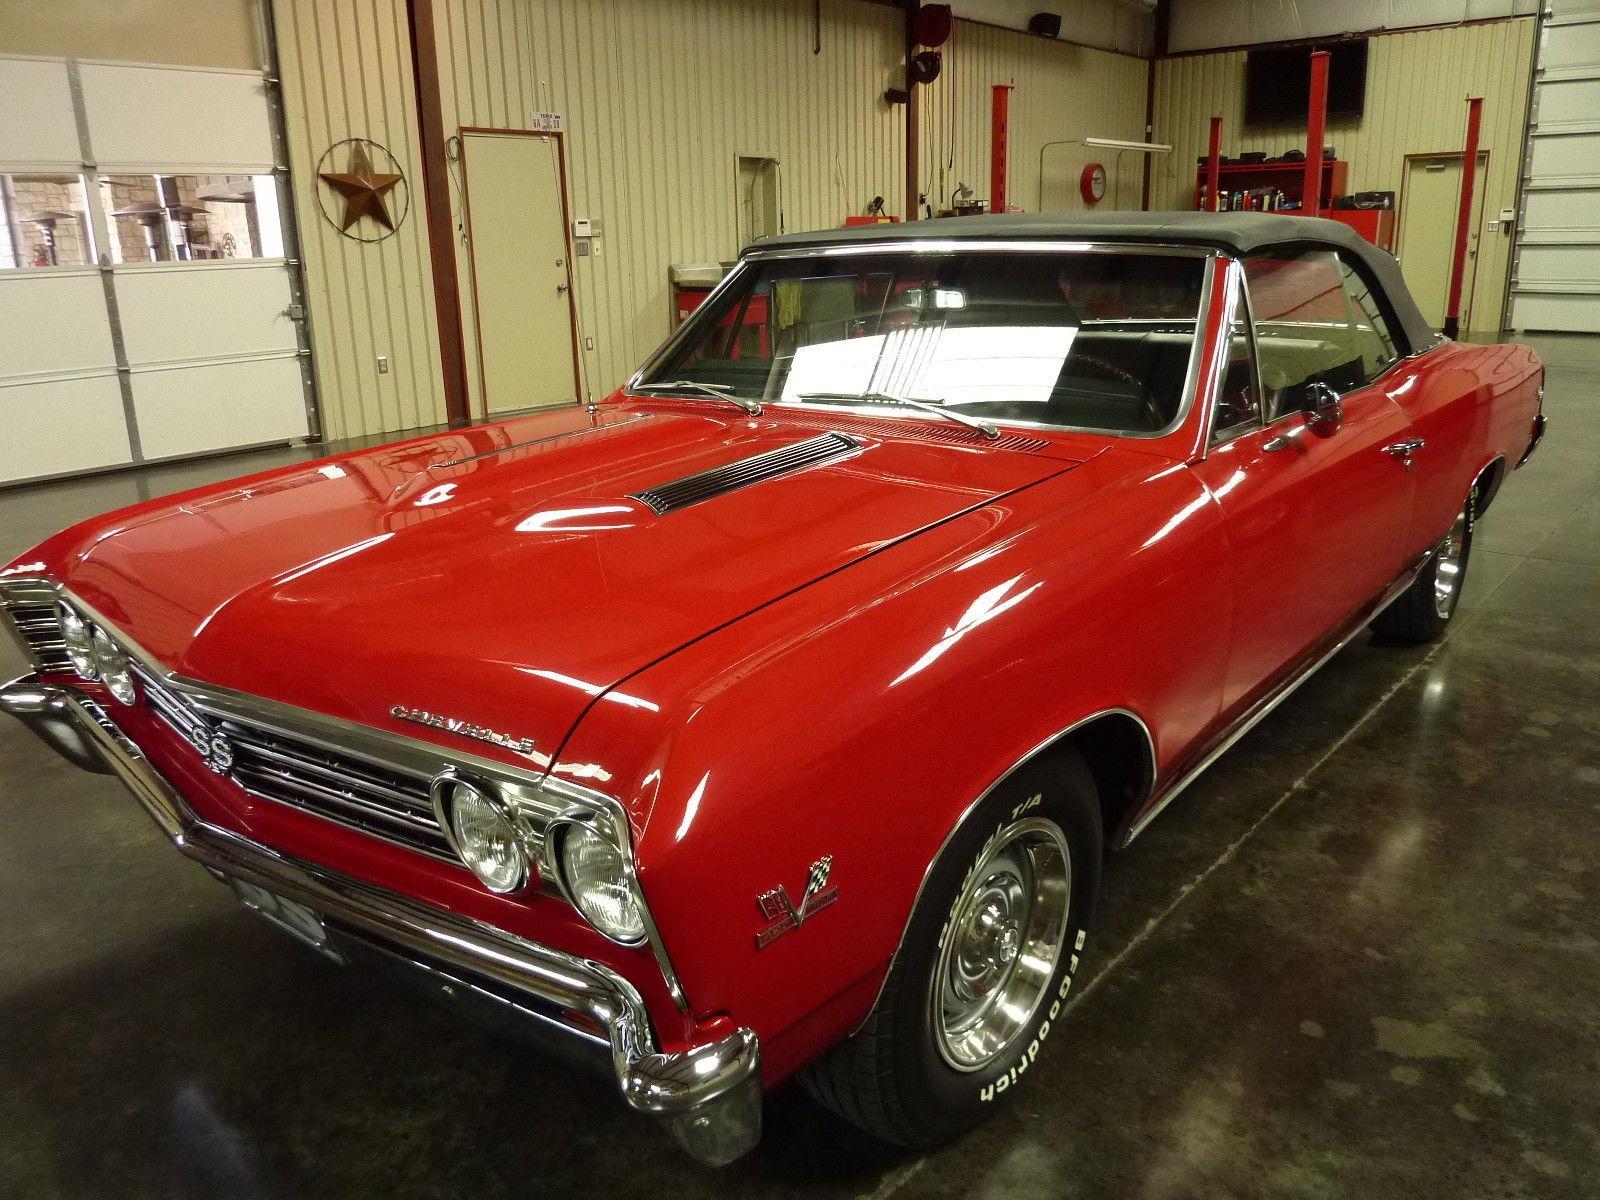 Fully restored 1967 Chevrolet Chevelle SS 396 for sale